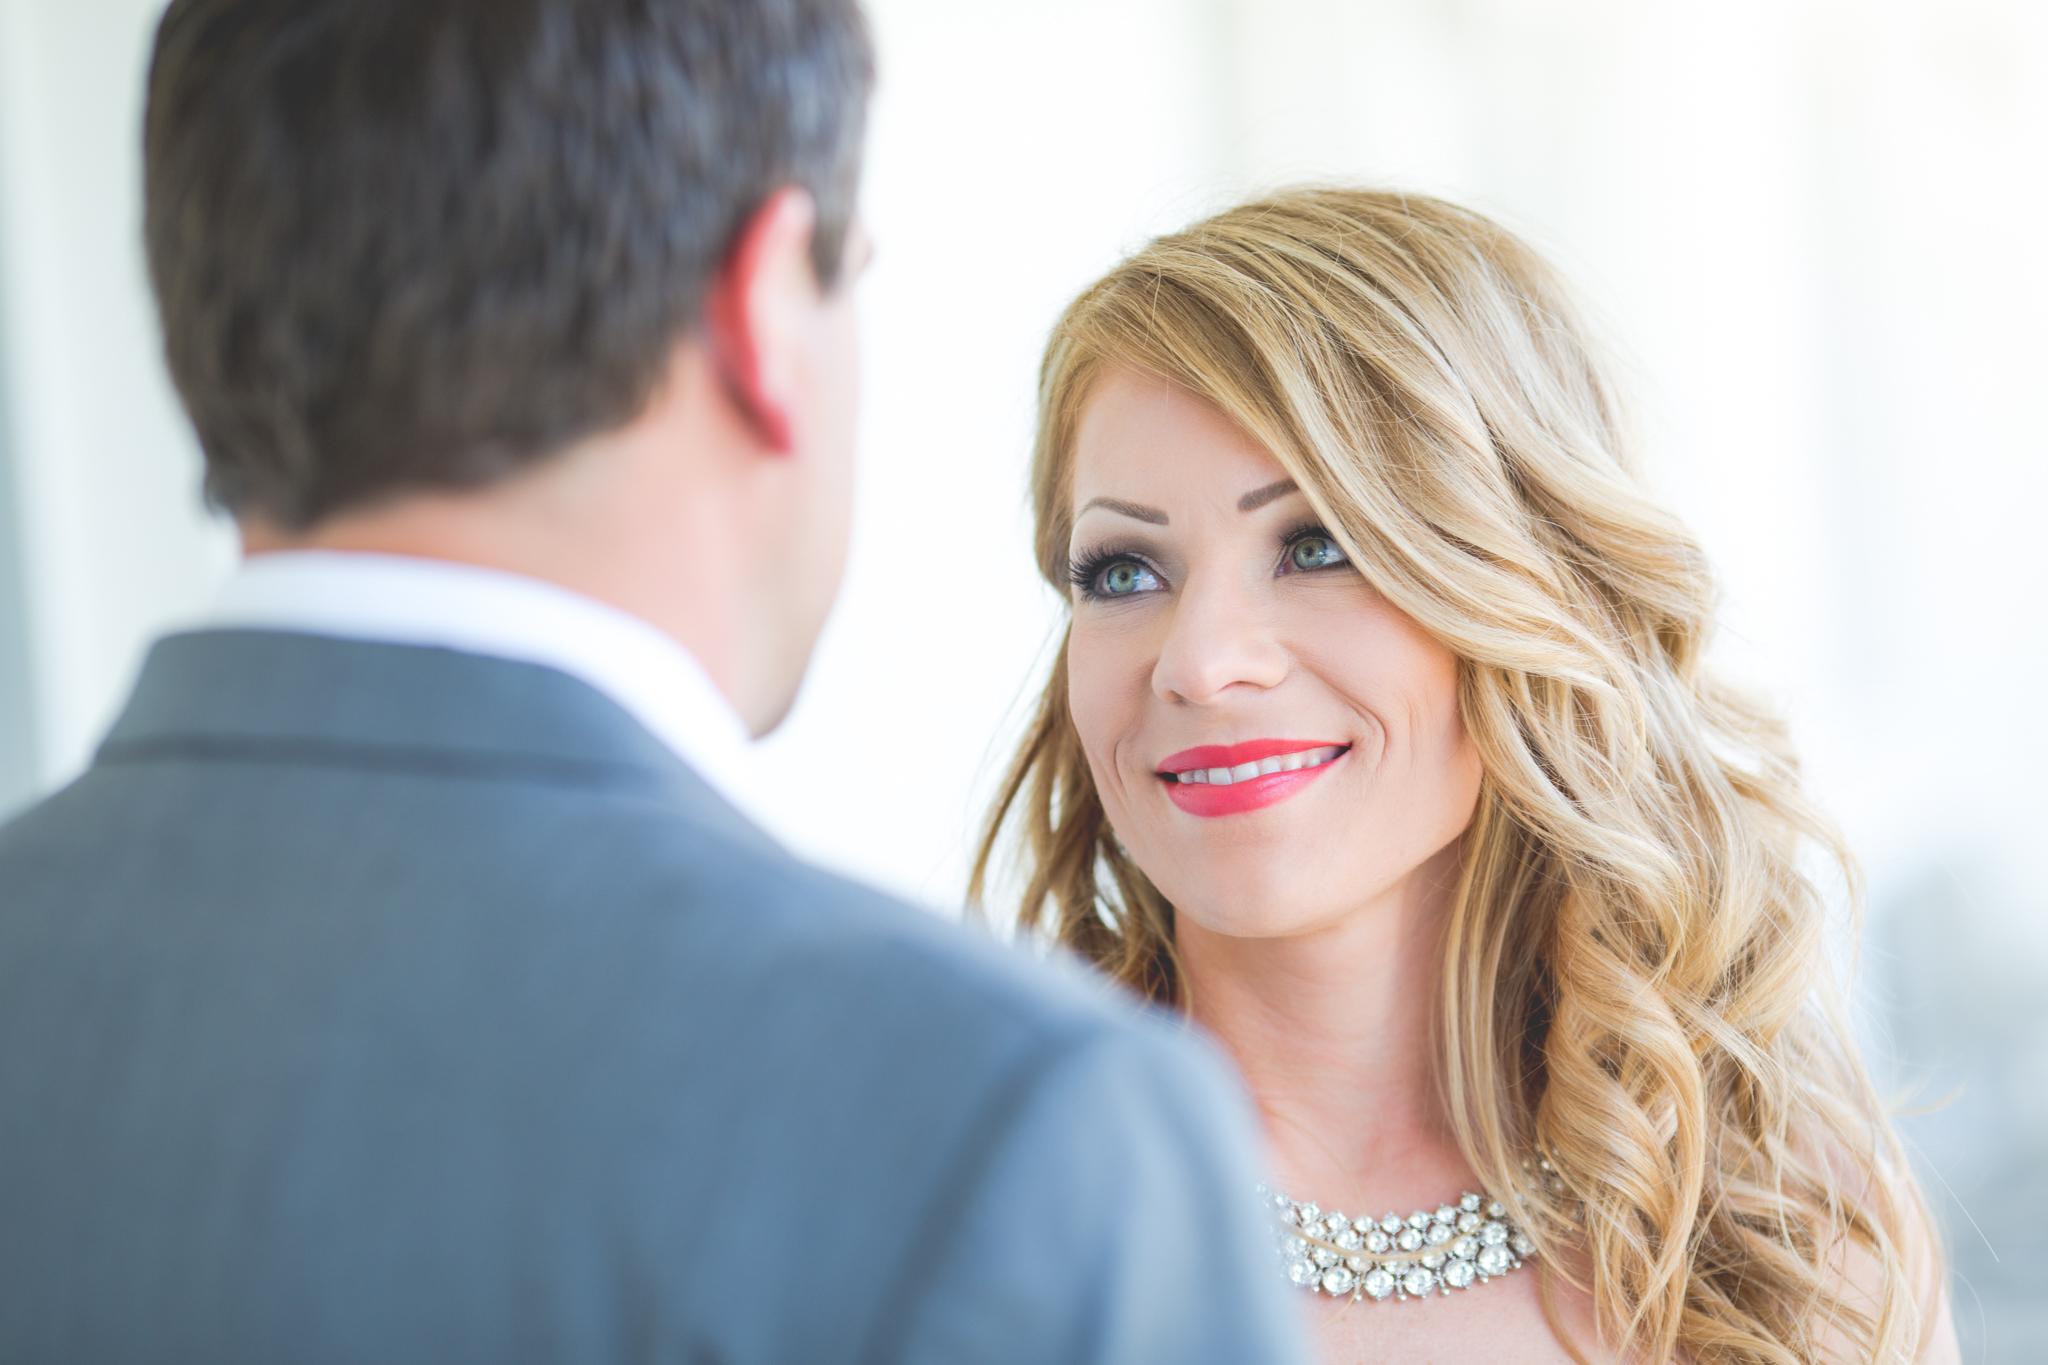 scottsdale-wedding-photographer-el-dorado-andrea-first-look-smiling